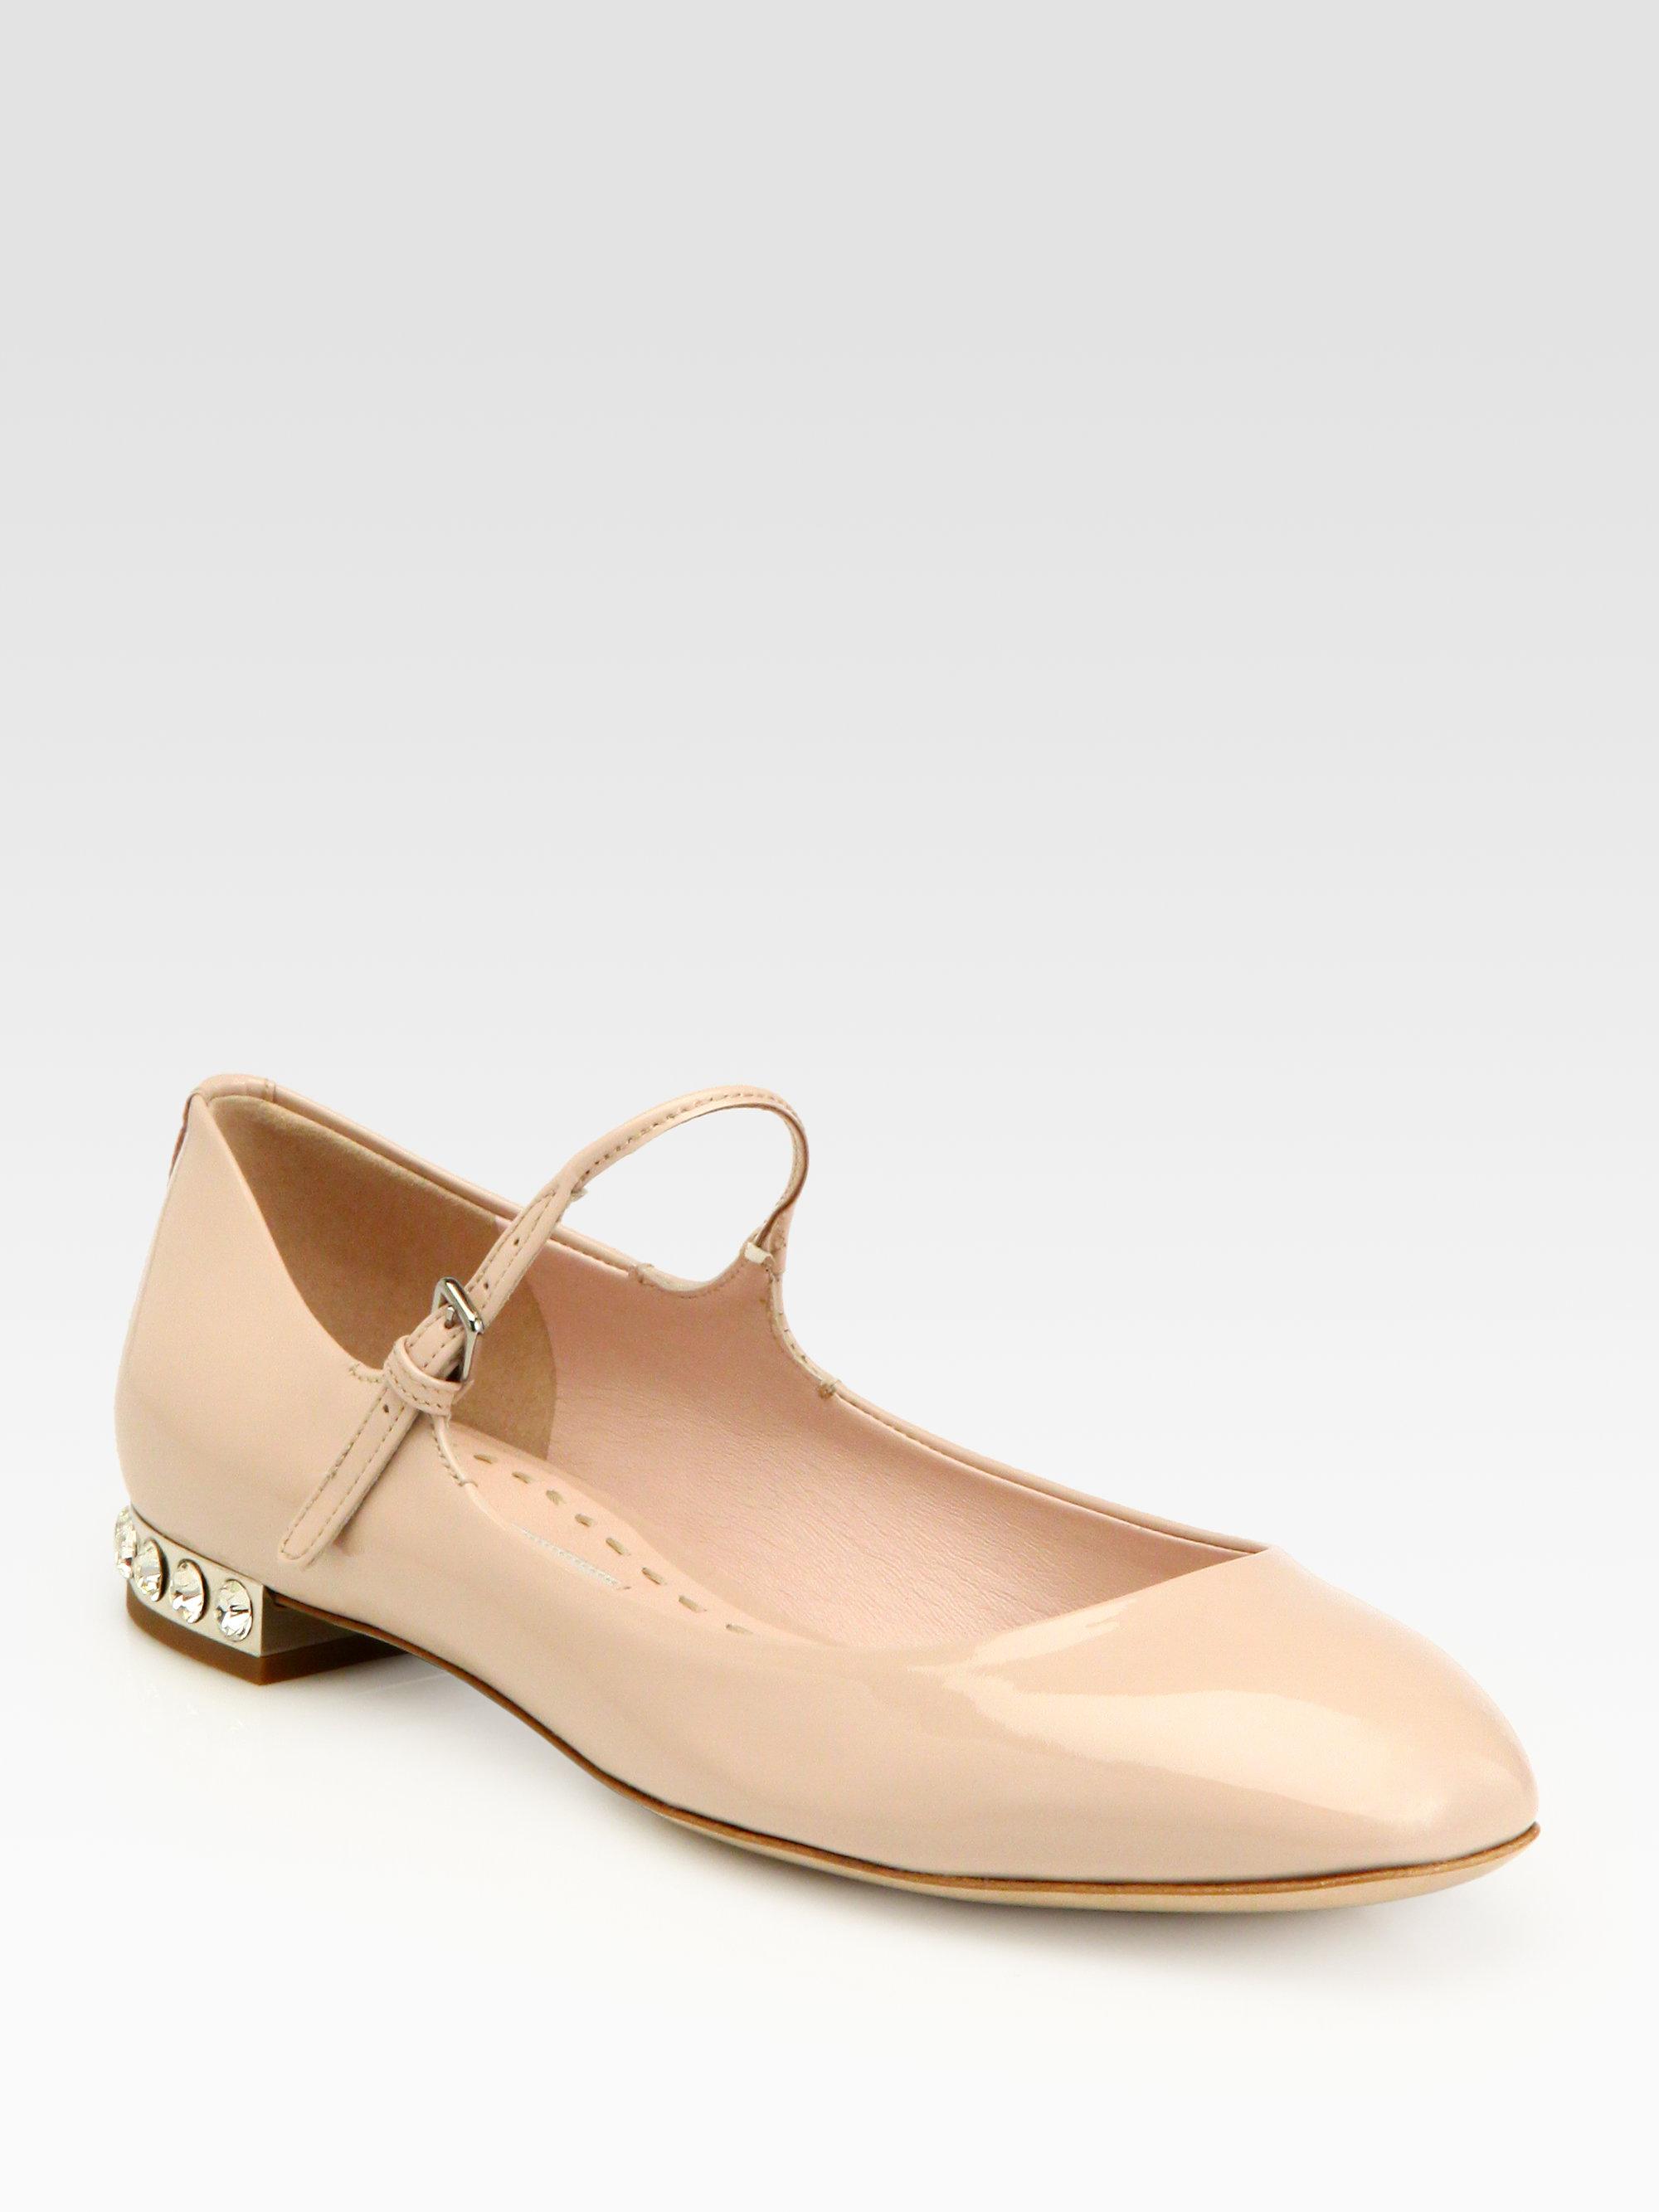 Miu Miu Prada Classic Patent Jeweled Heel Mary Jane Shoes EU 39.5 8.5   eBay